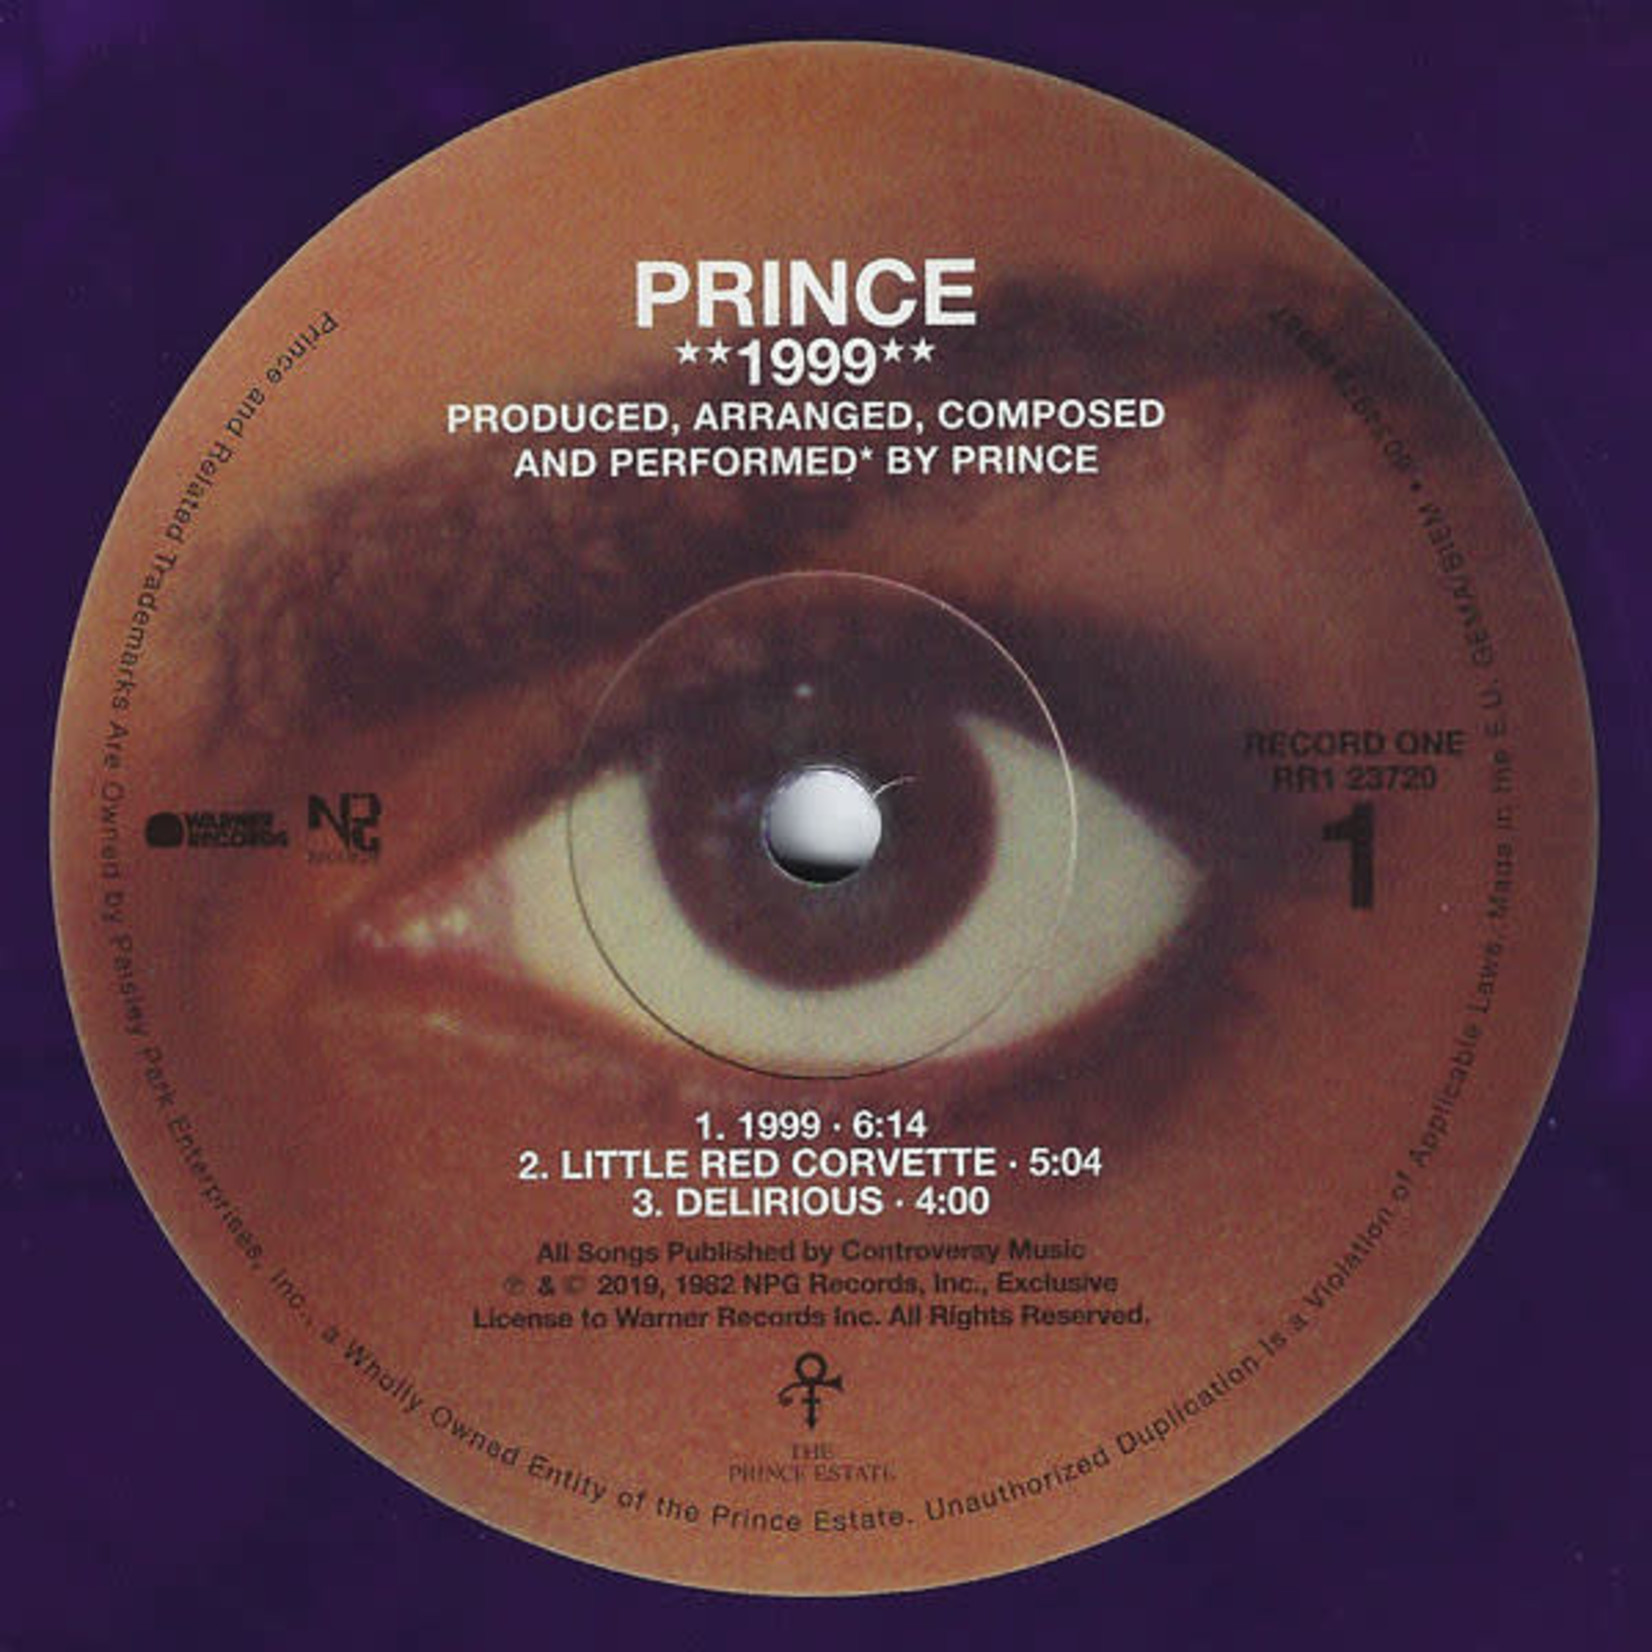 PRINCE 1999 (REMASTERED) 2LP